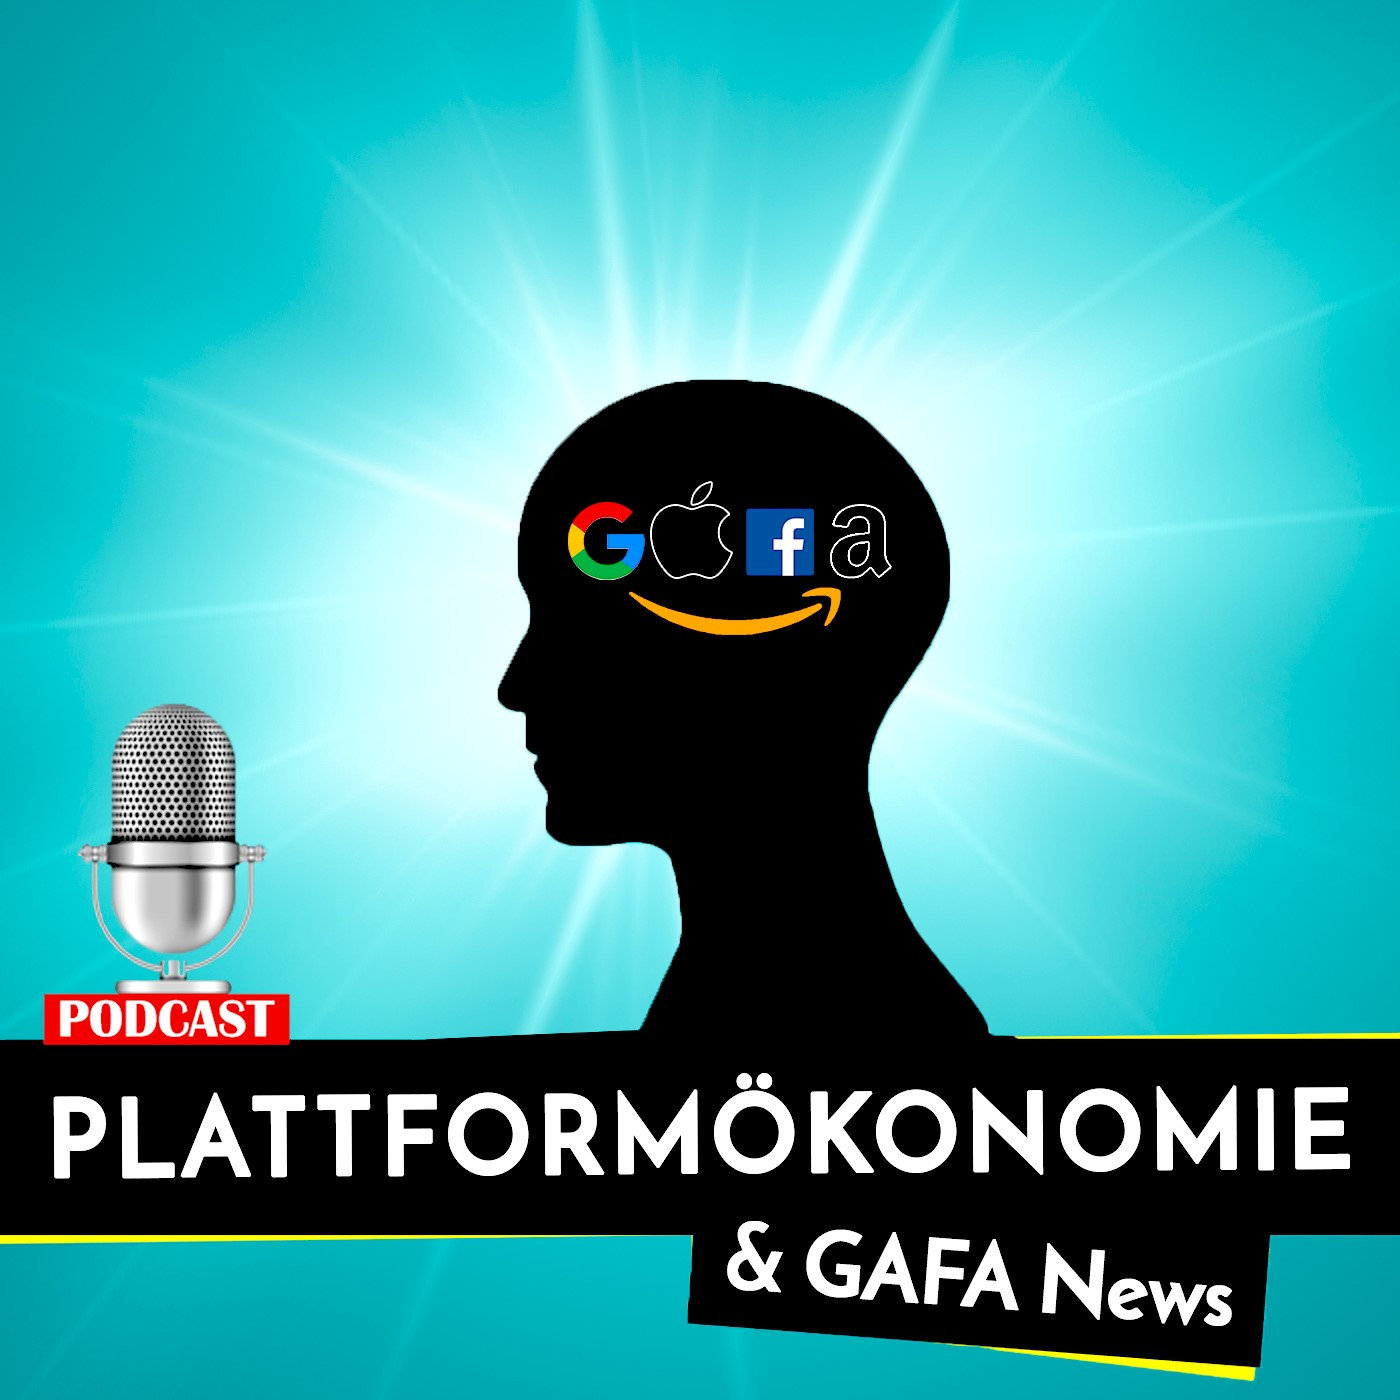 Startup & eCommerce News: Home24, Westwing, IKEA, Disney+, Kapten & Son, Samwer, Rocket Internet, Razor